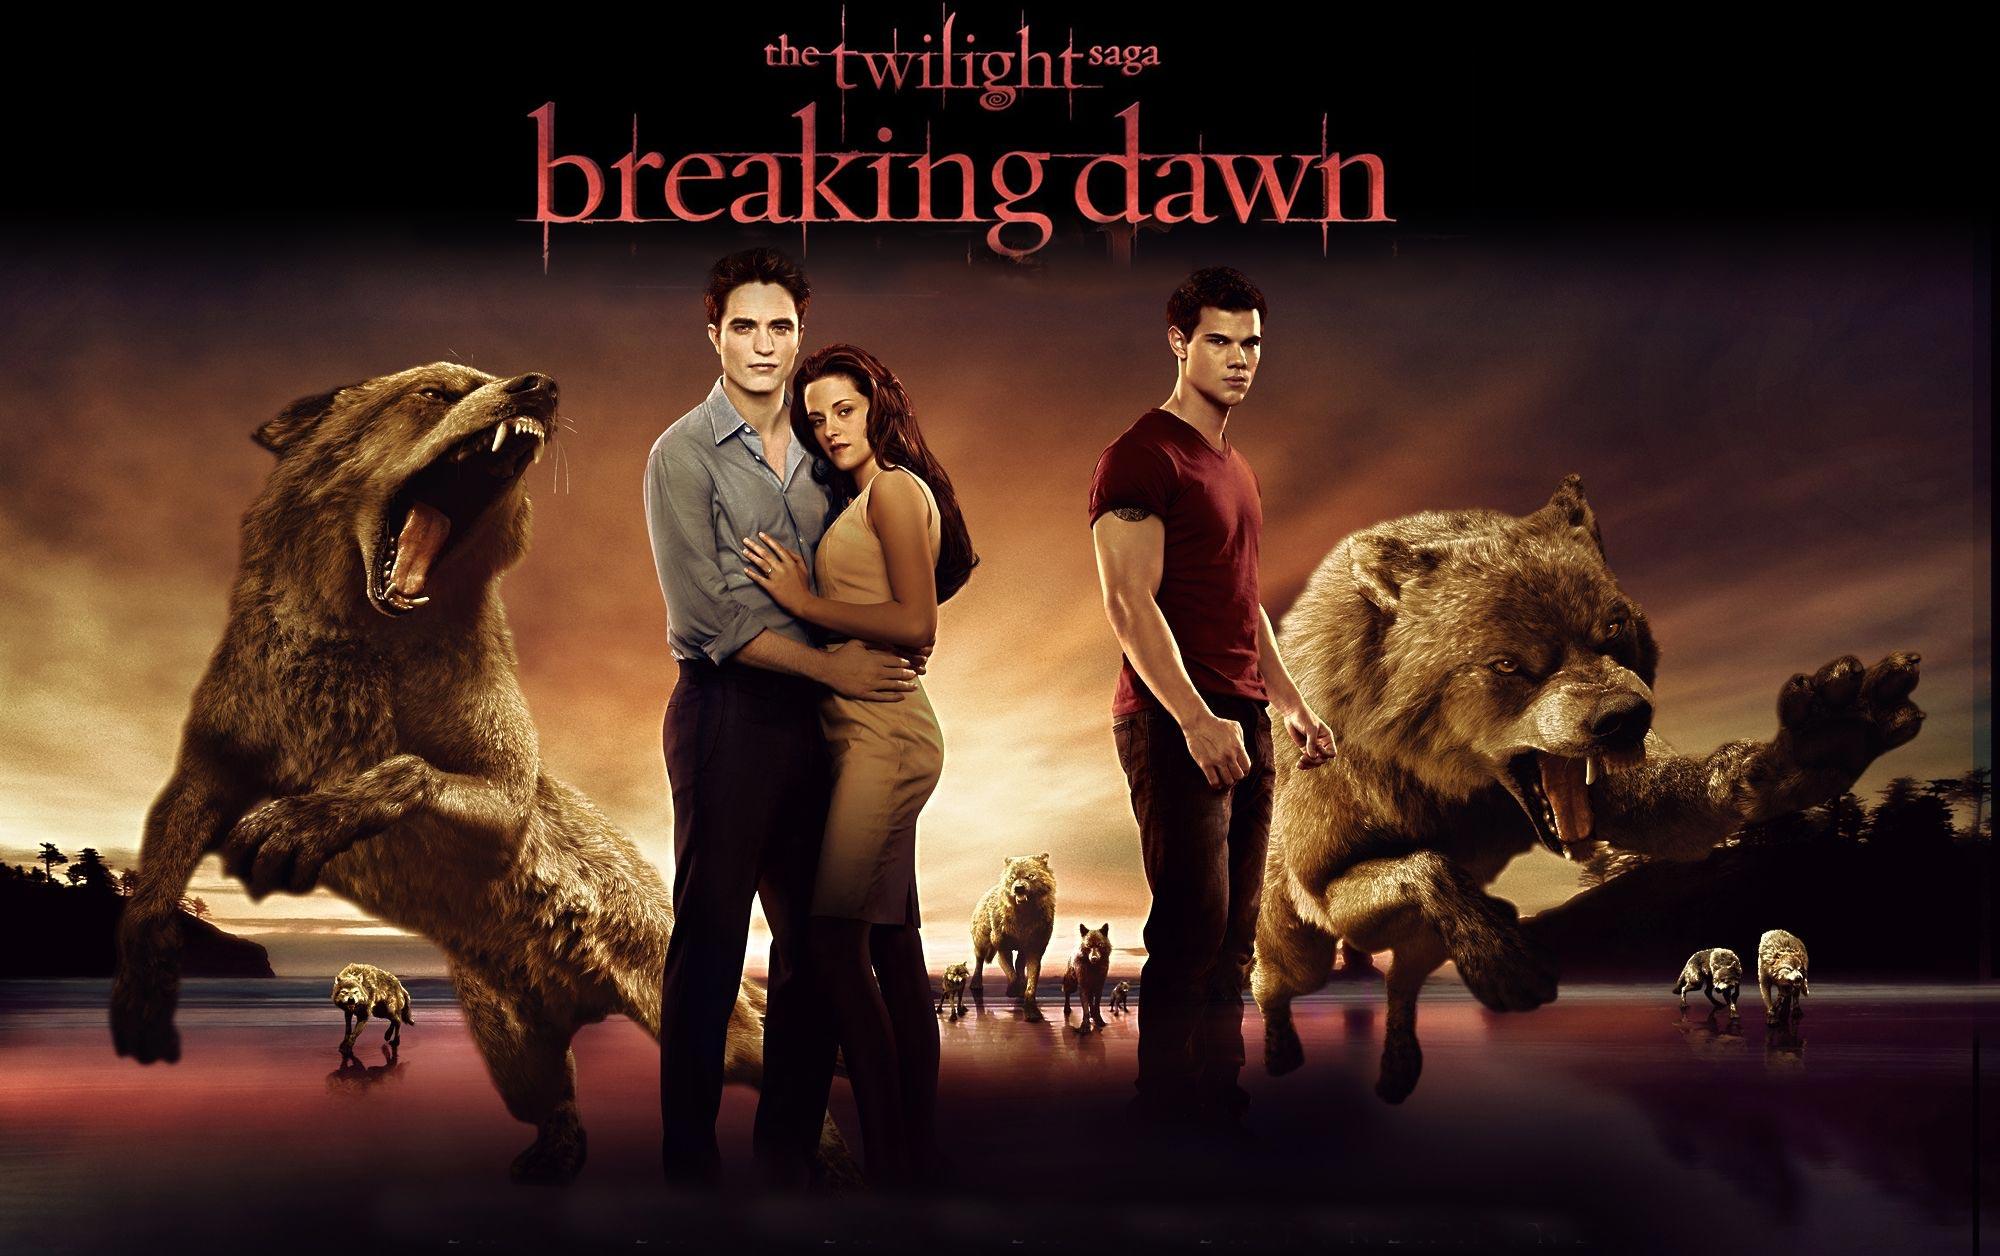 The twilight saga breaking dawn – part 1 opens tonight and i'm